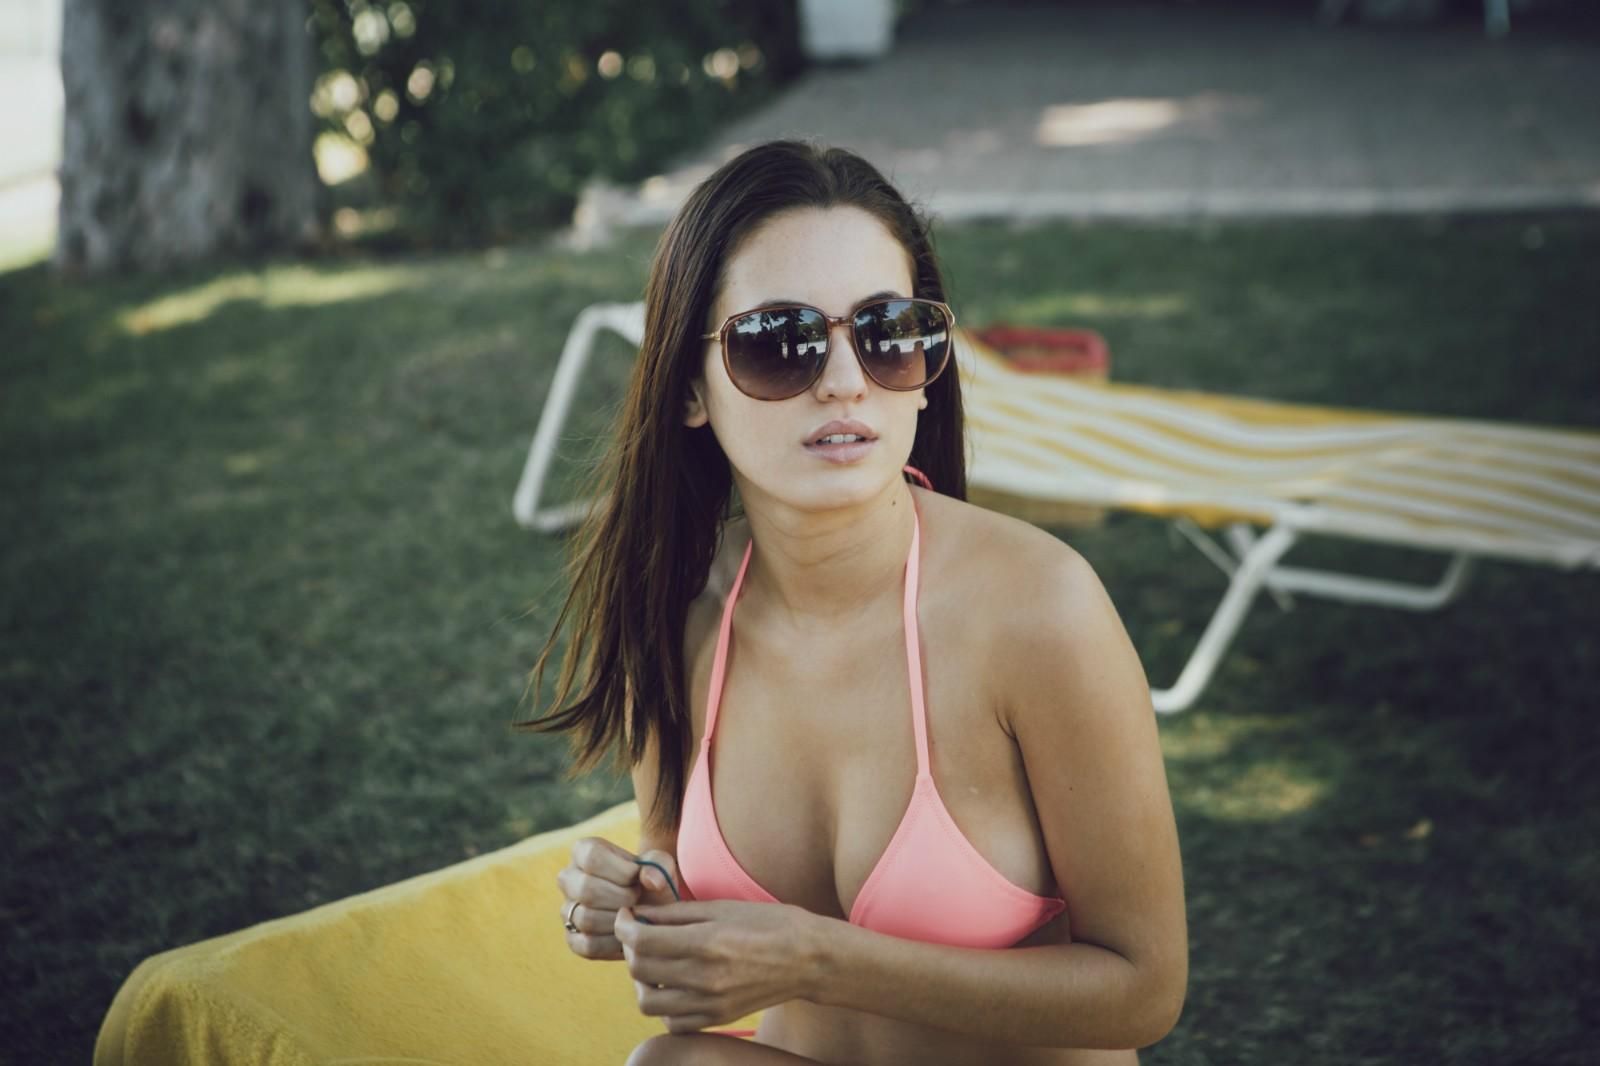 Ivana Baquero fotos desnuda hackeadas